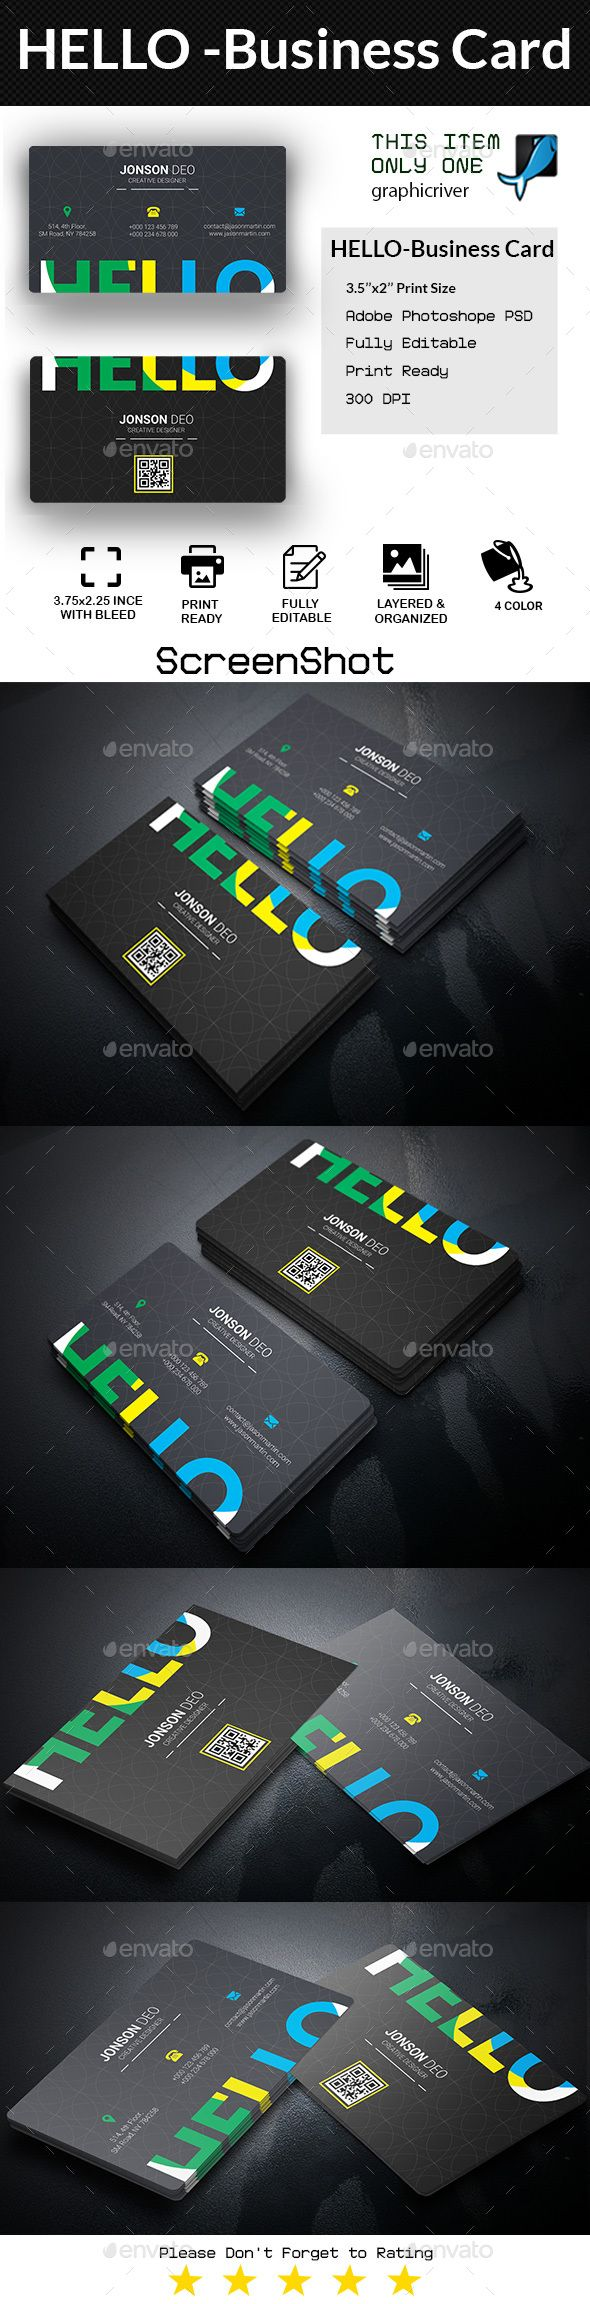 HELLO - Business Card Template PSD